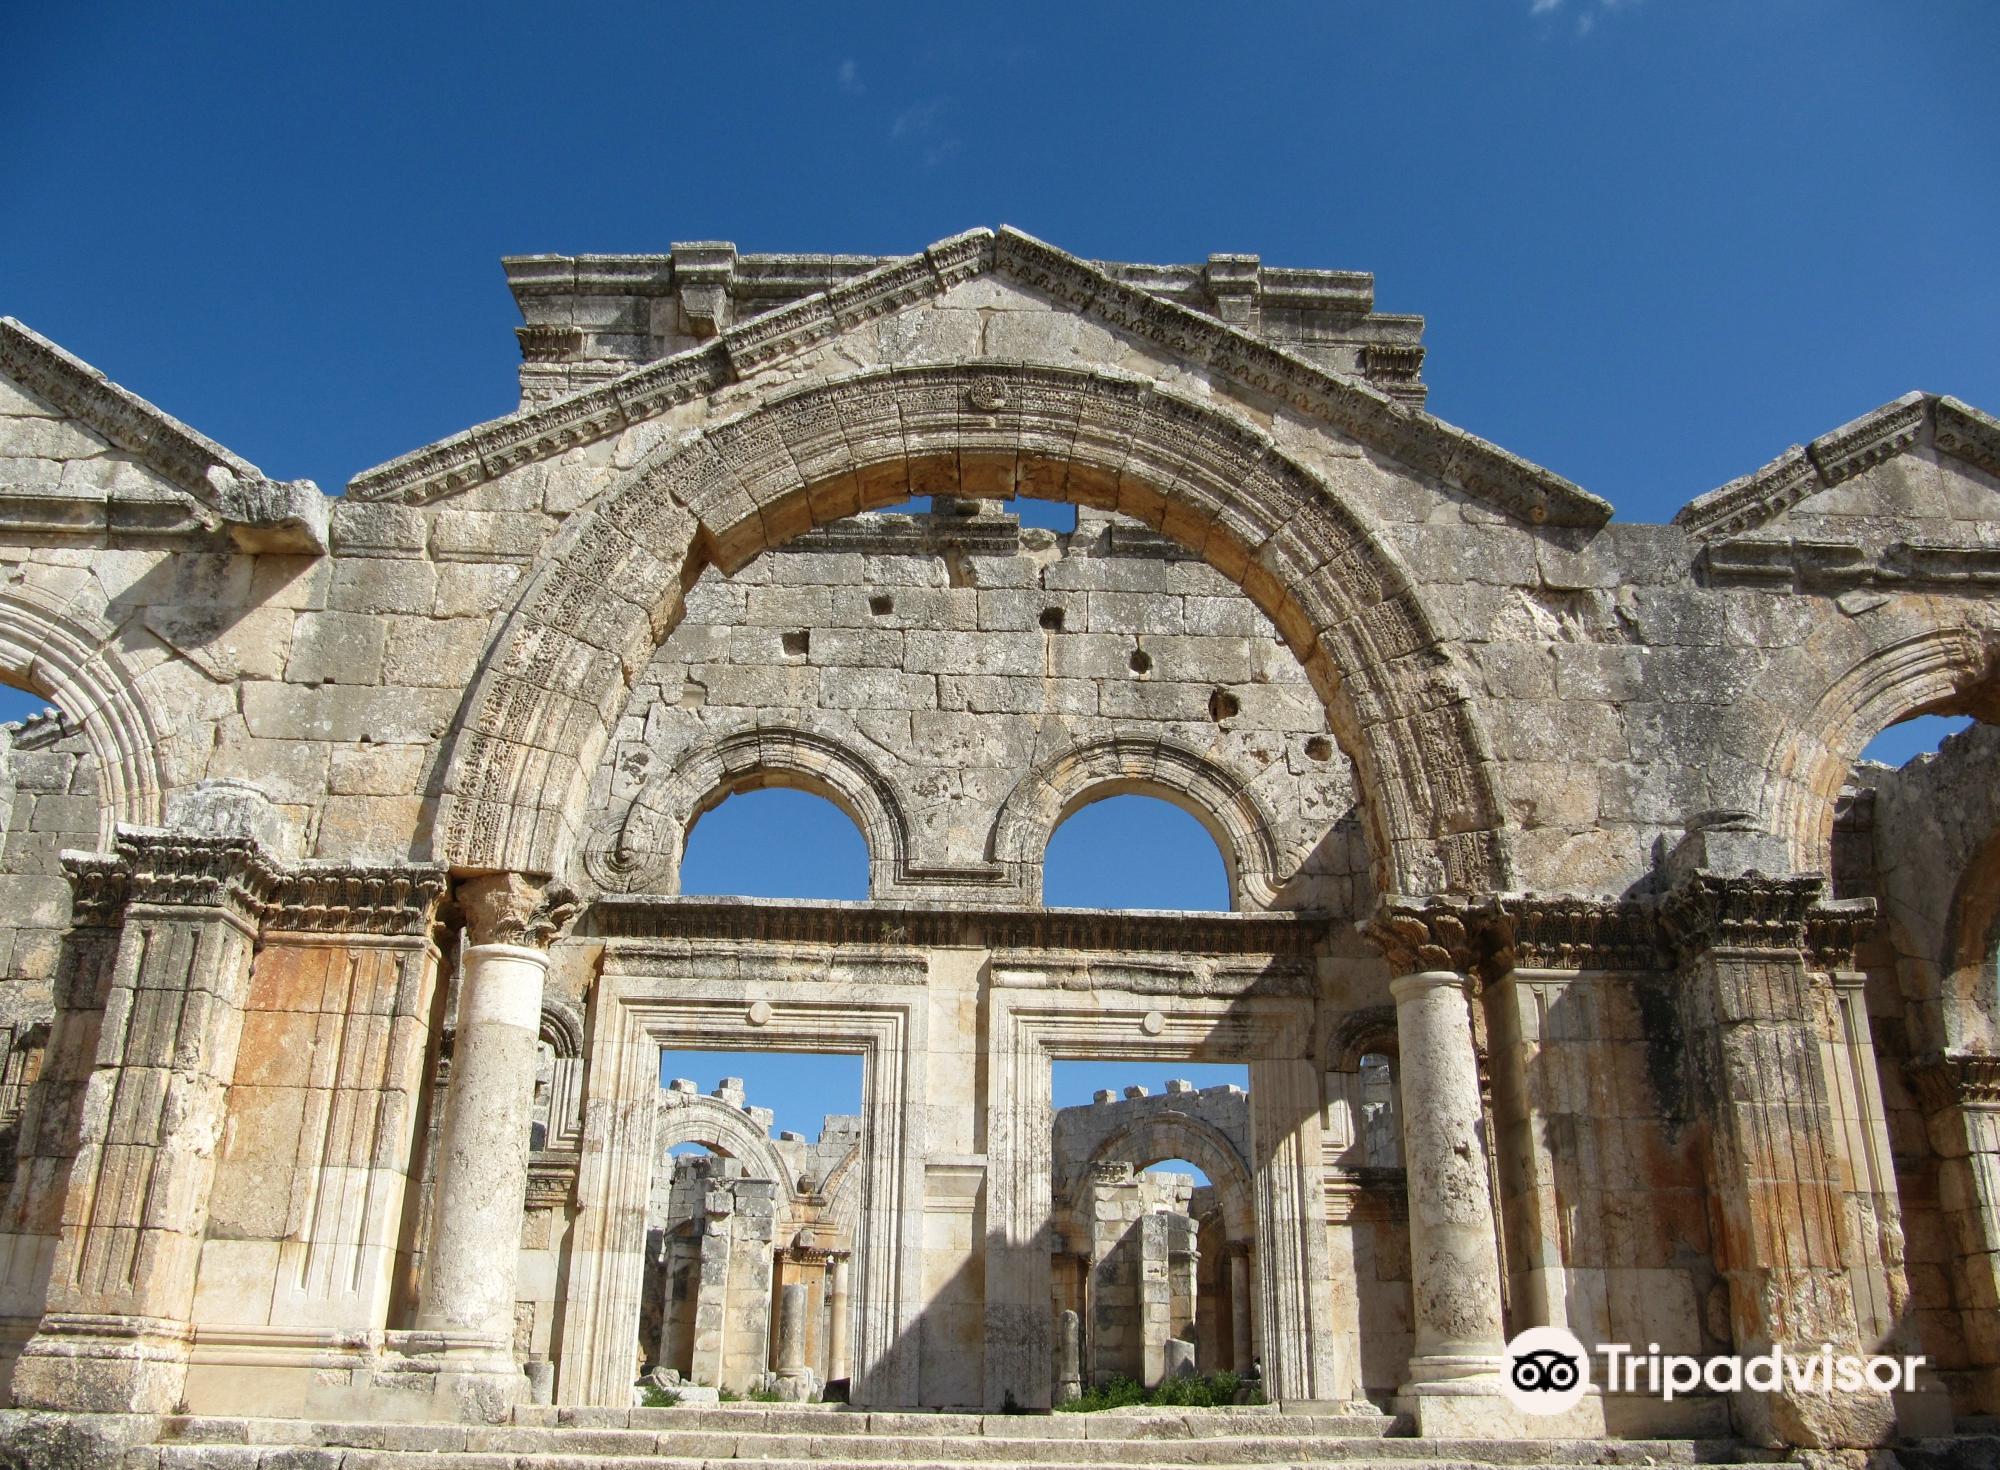 Saint Simon Citadel (Sam'an Citadel, Qalat Samaan)